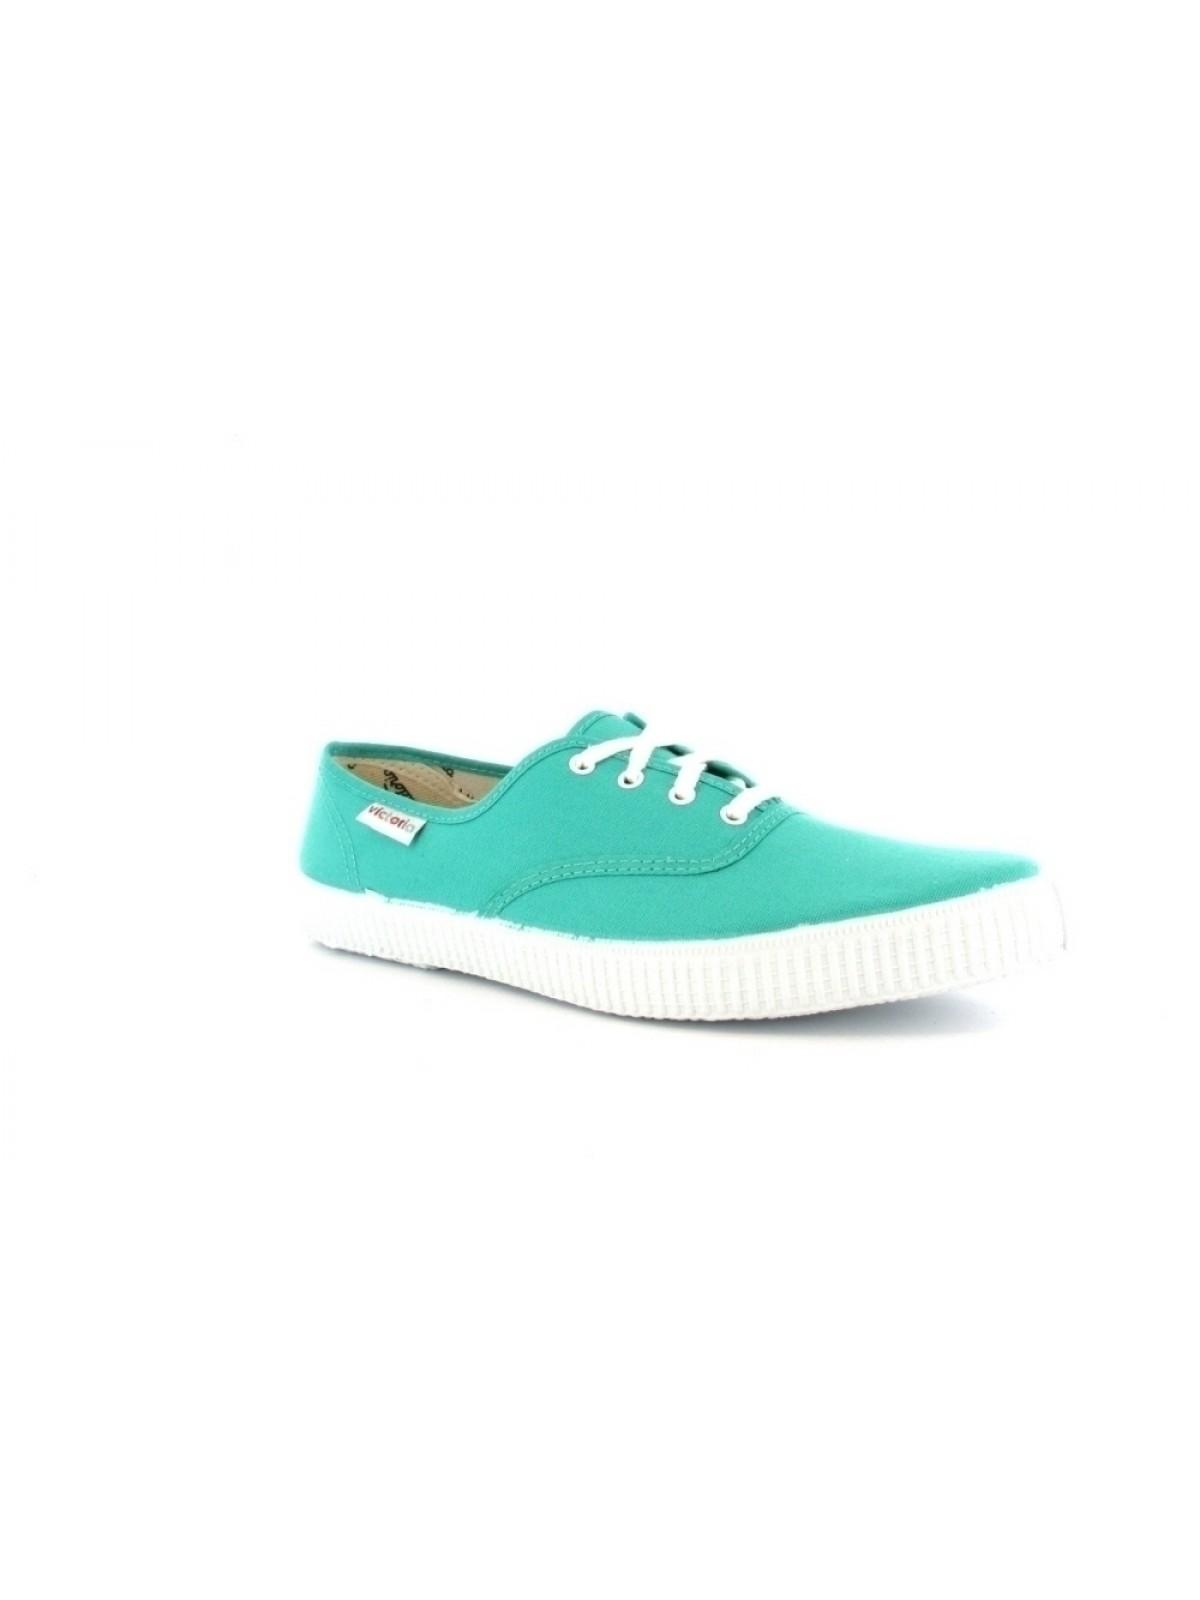 Victoria Z  toile vert turquoise